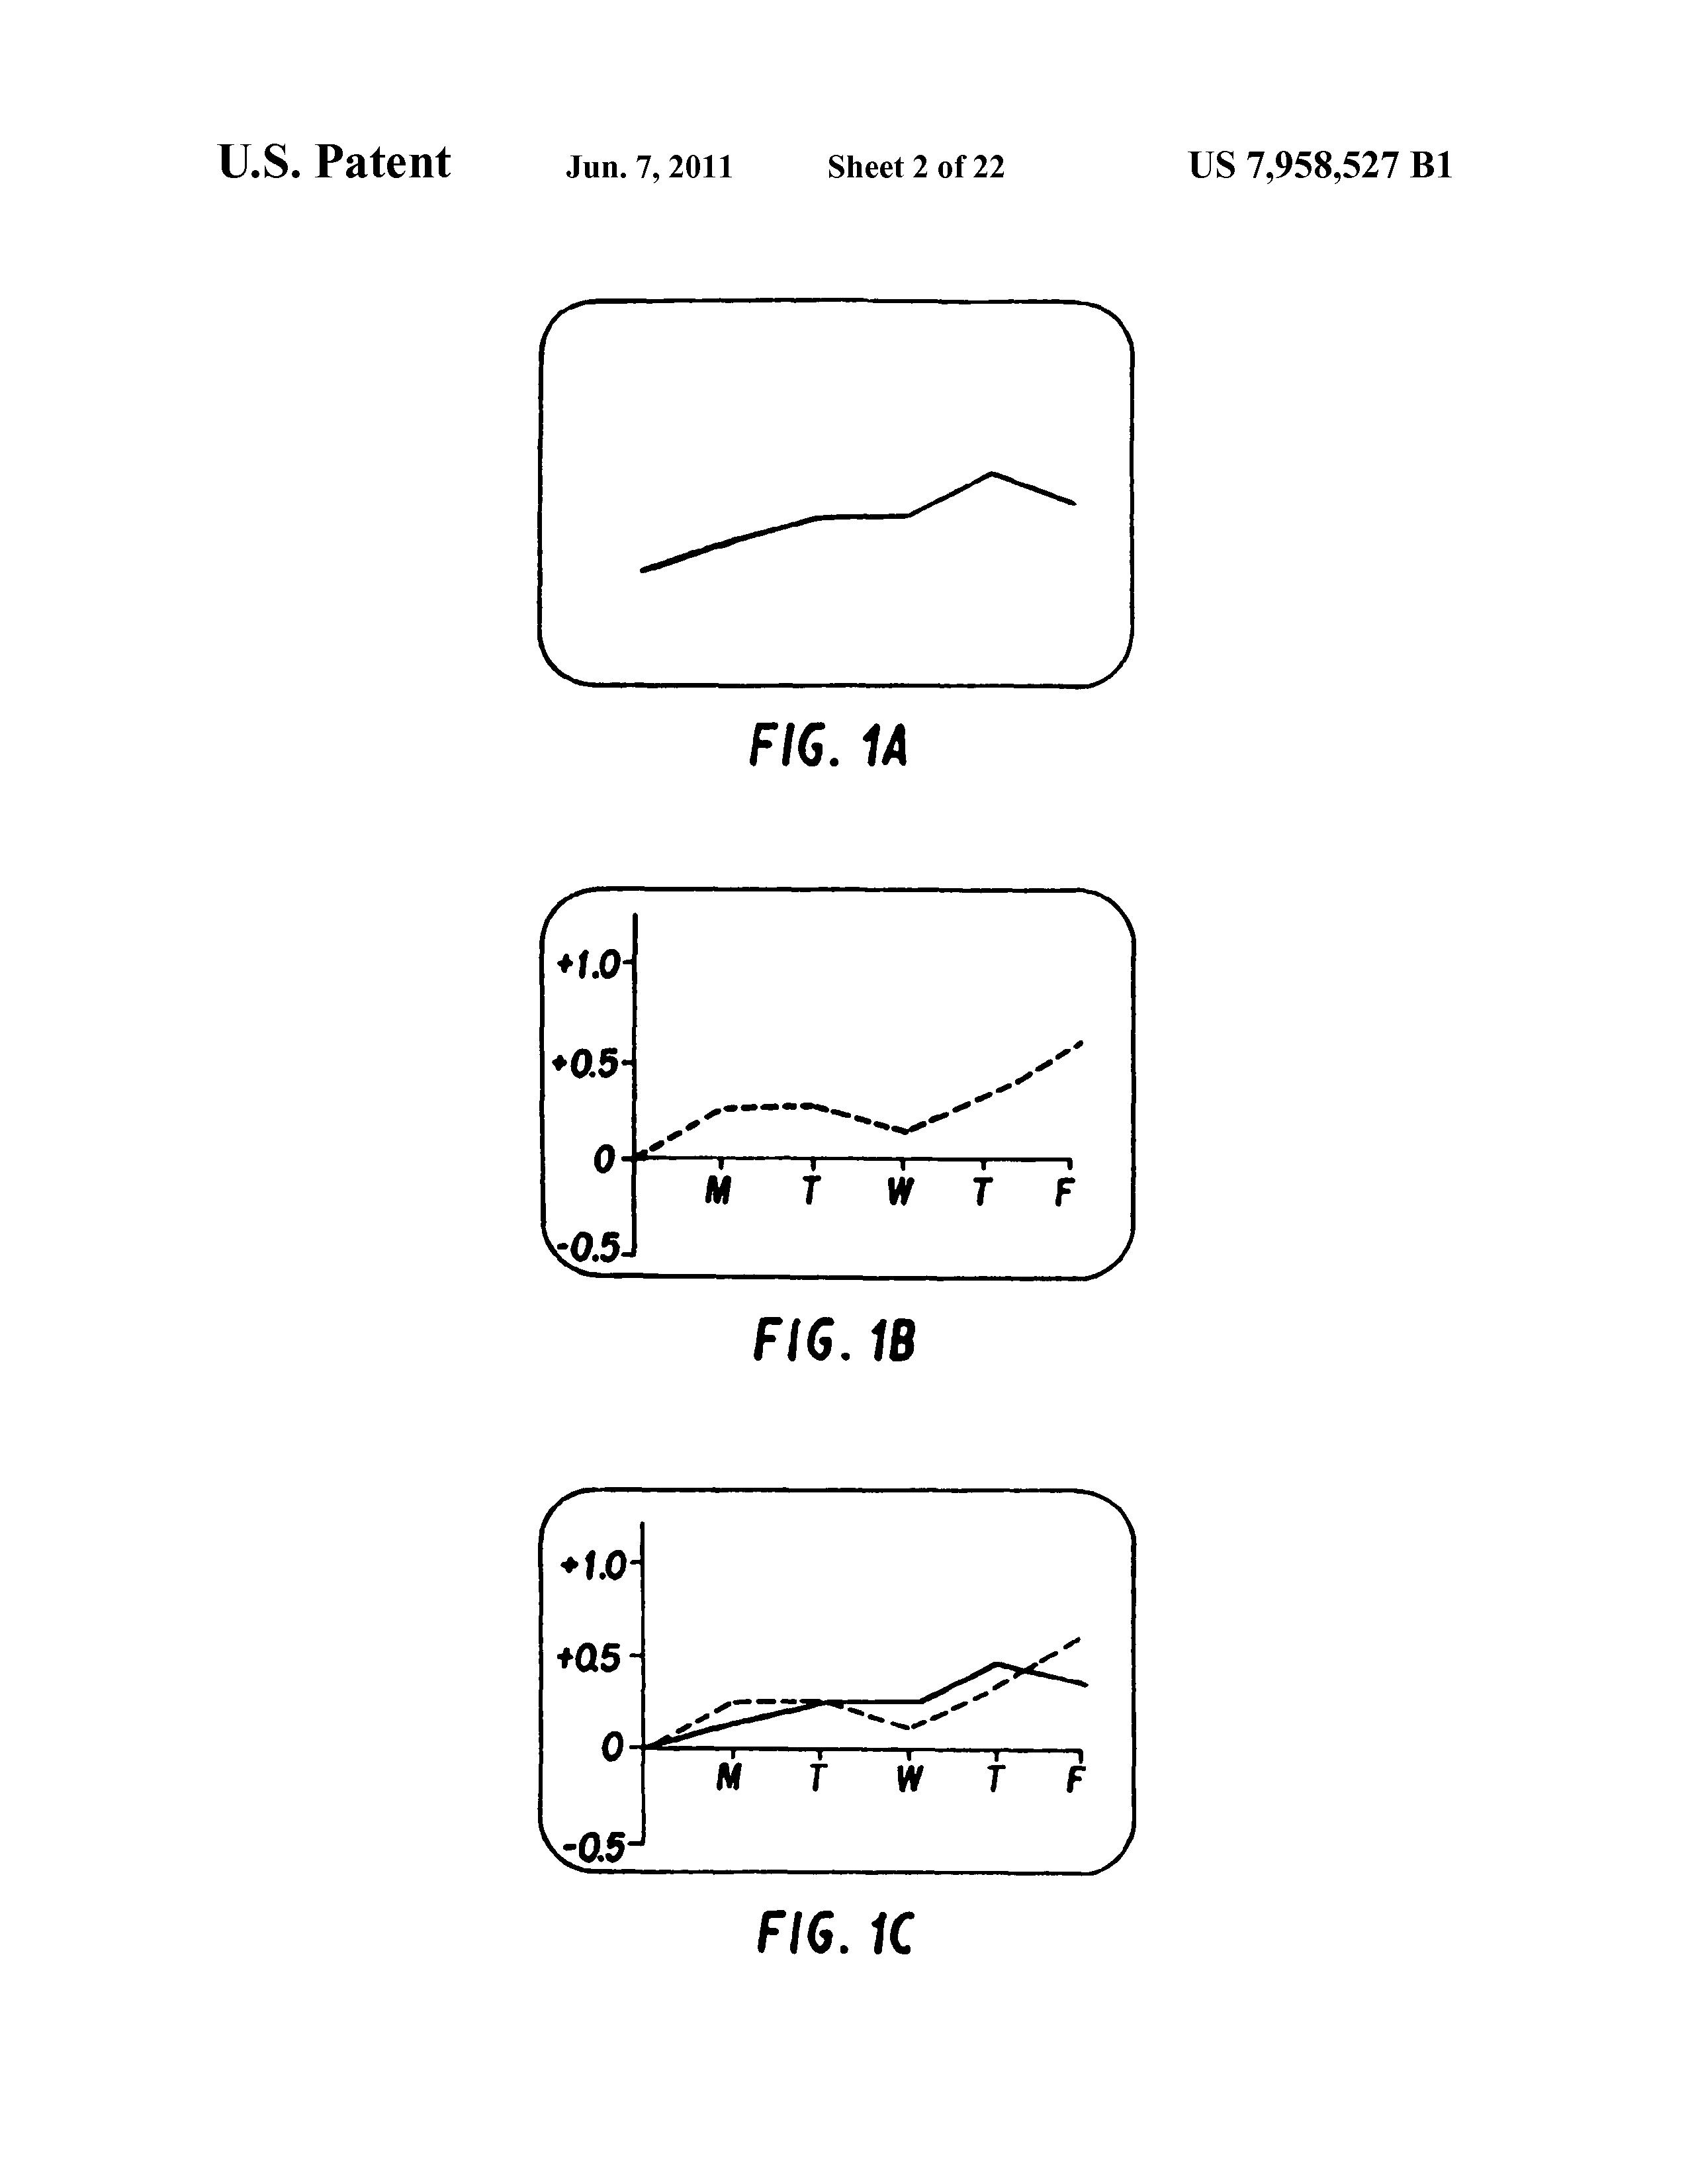 US7958527B1 - Signal processing apparatus and methods